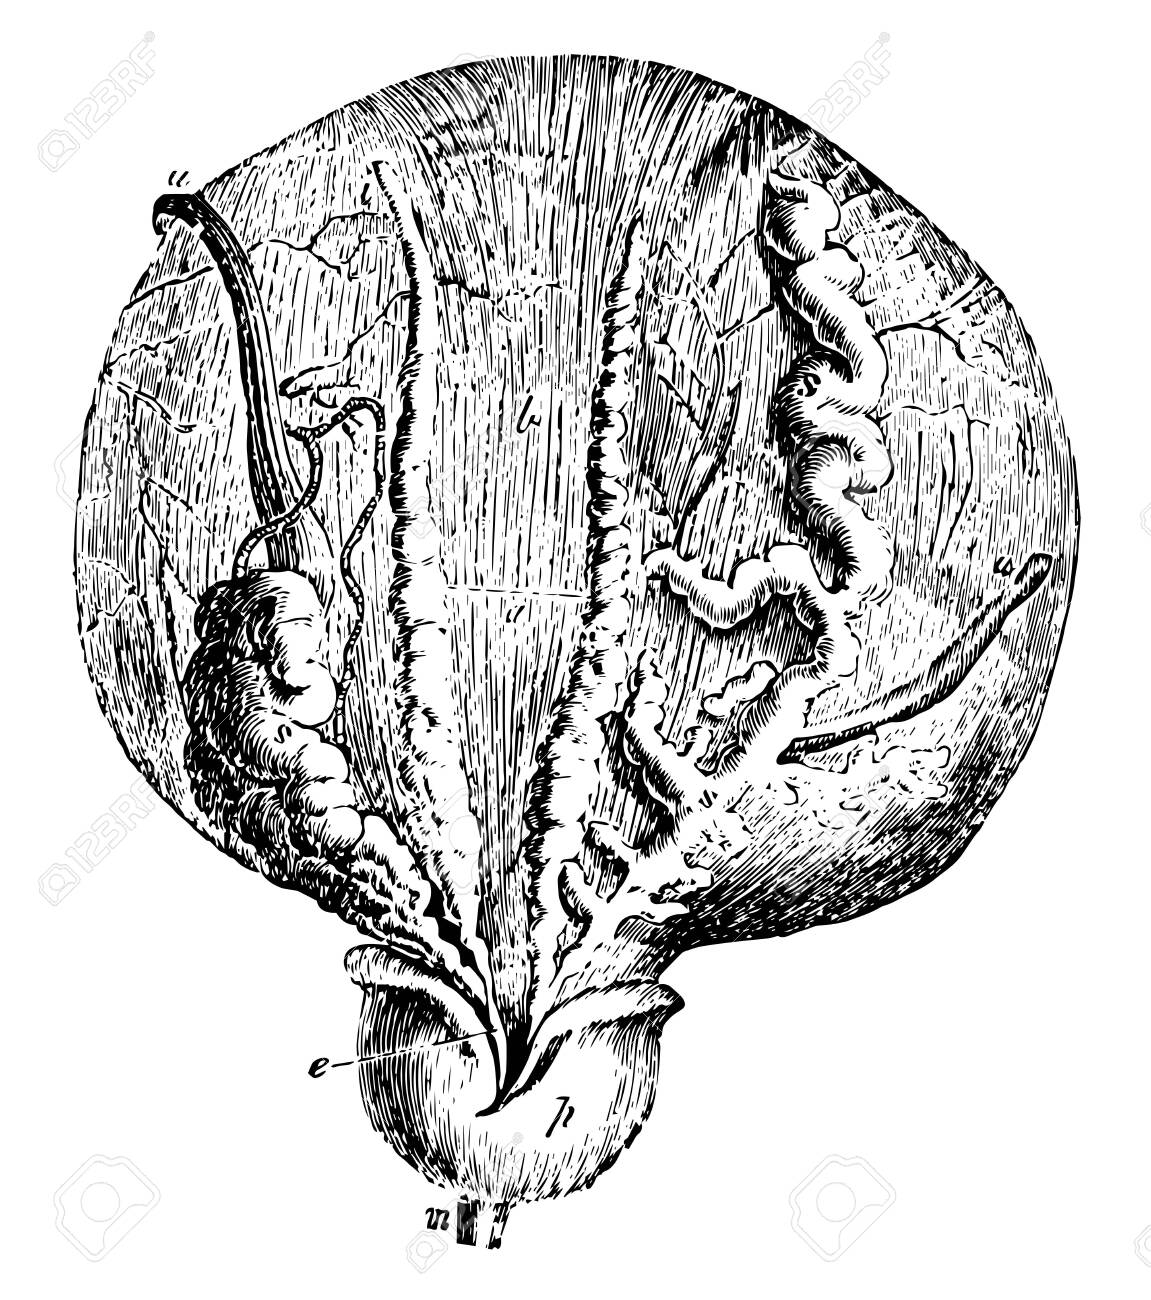 This illustration represents Bladder and Prostate Gland, vintage line drawing or engraving illustration. - 133022799